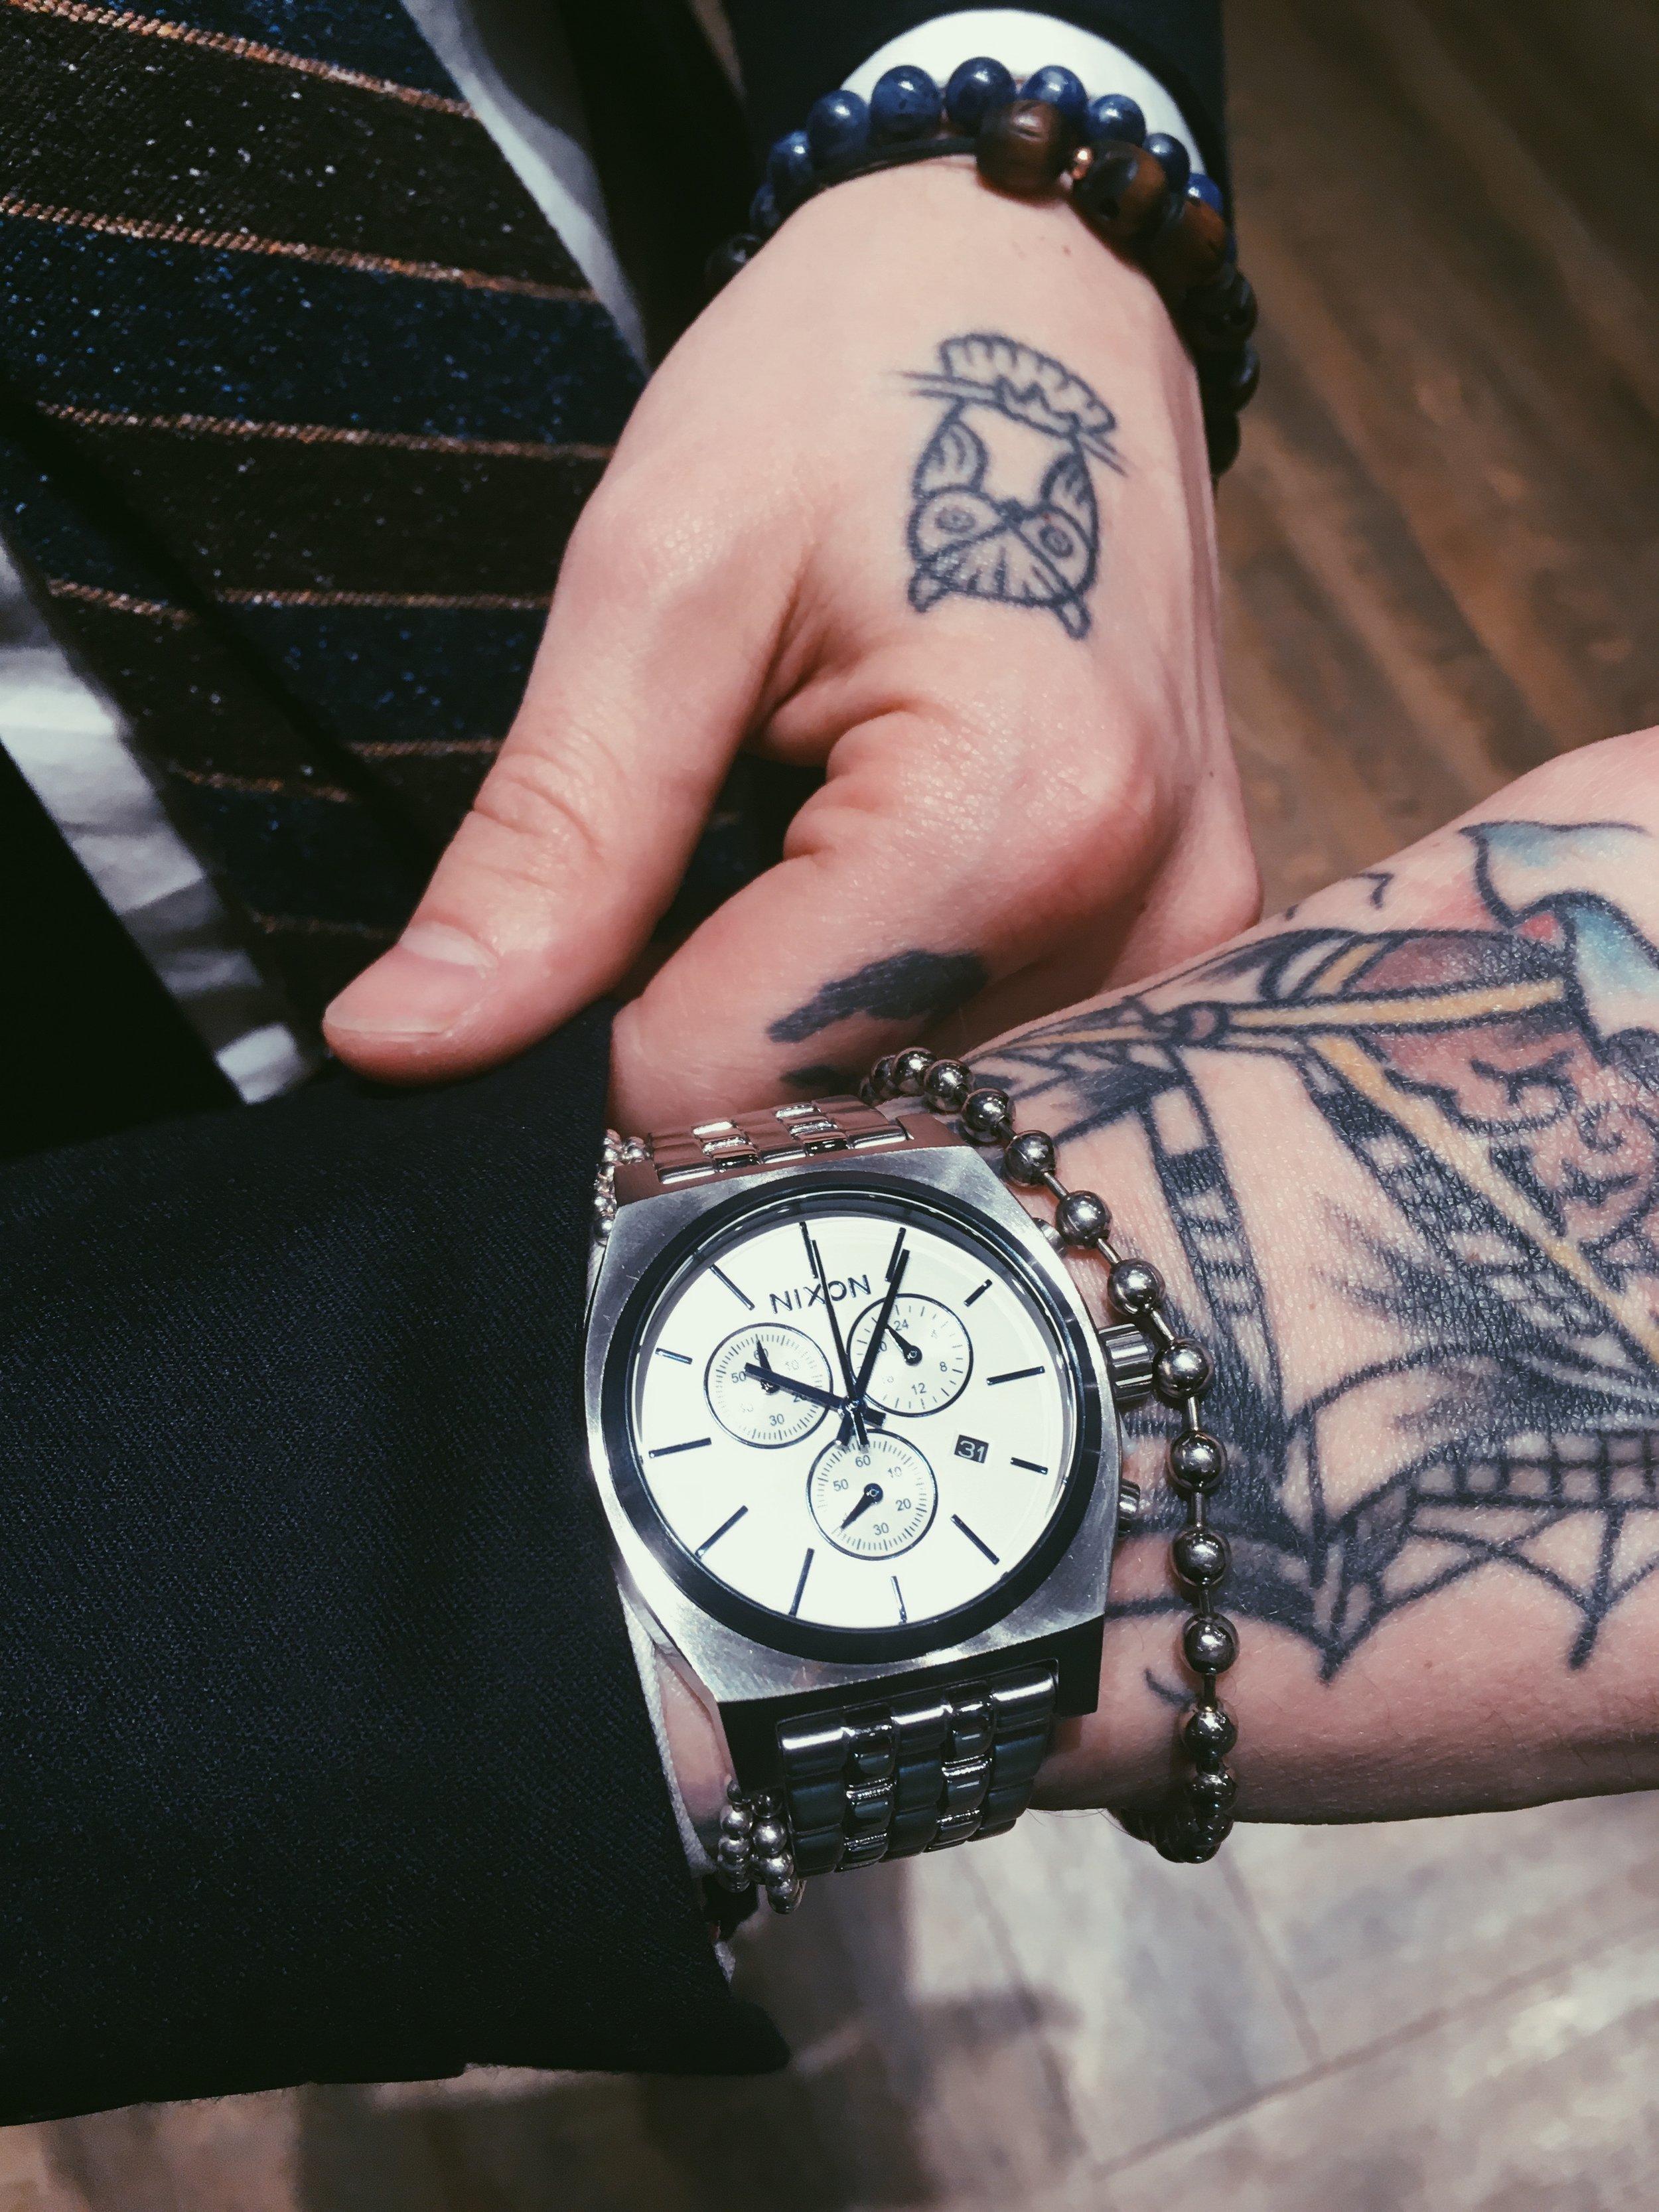 Nixon Time Teller Chrono Watch $275